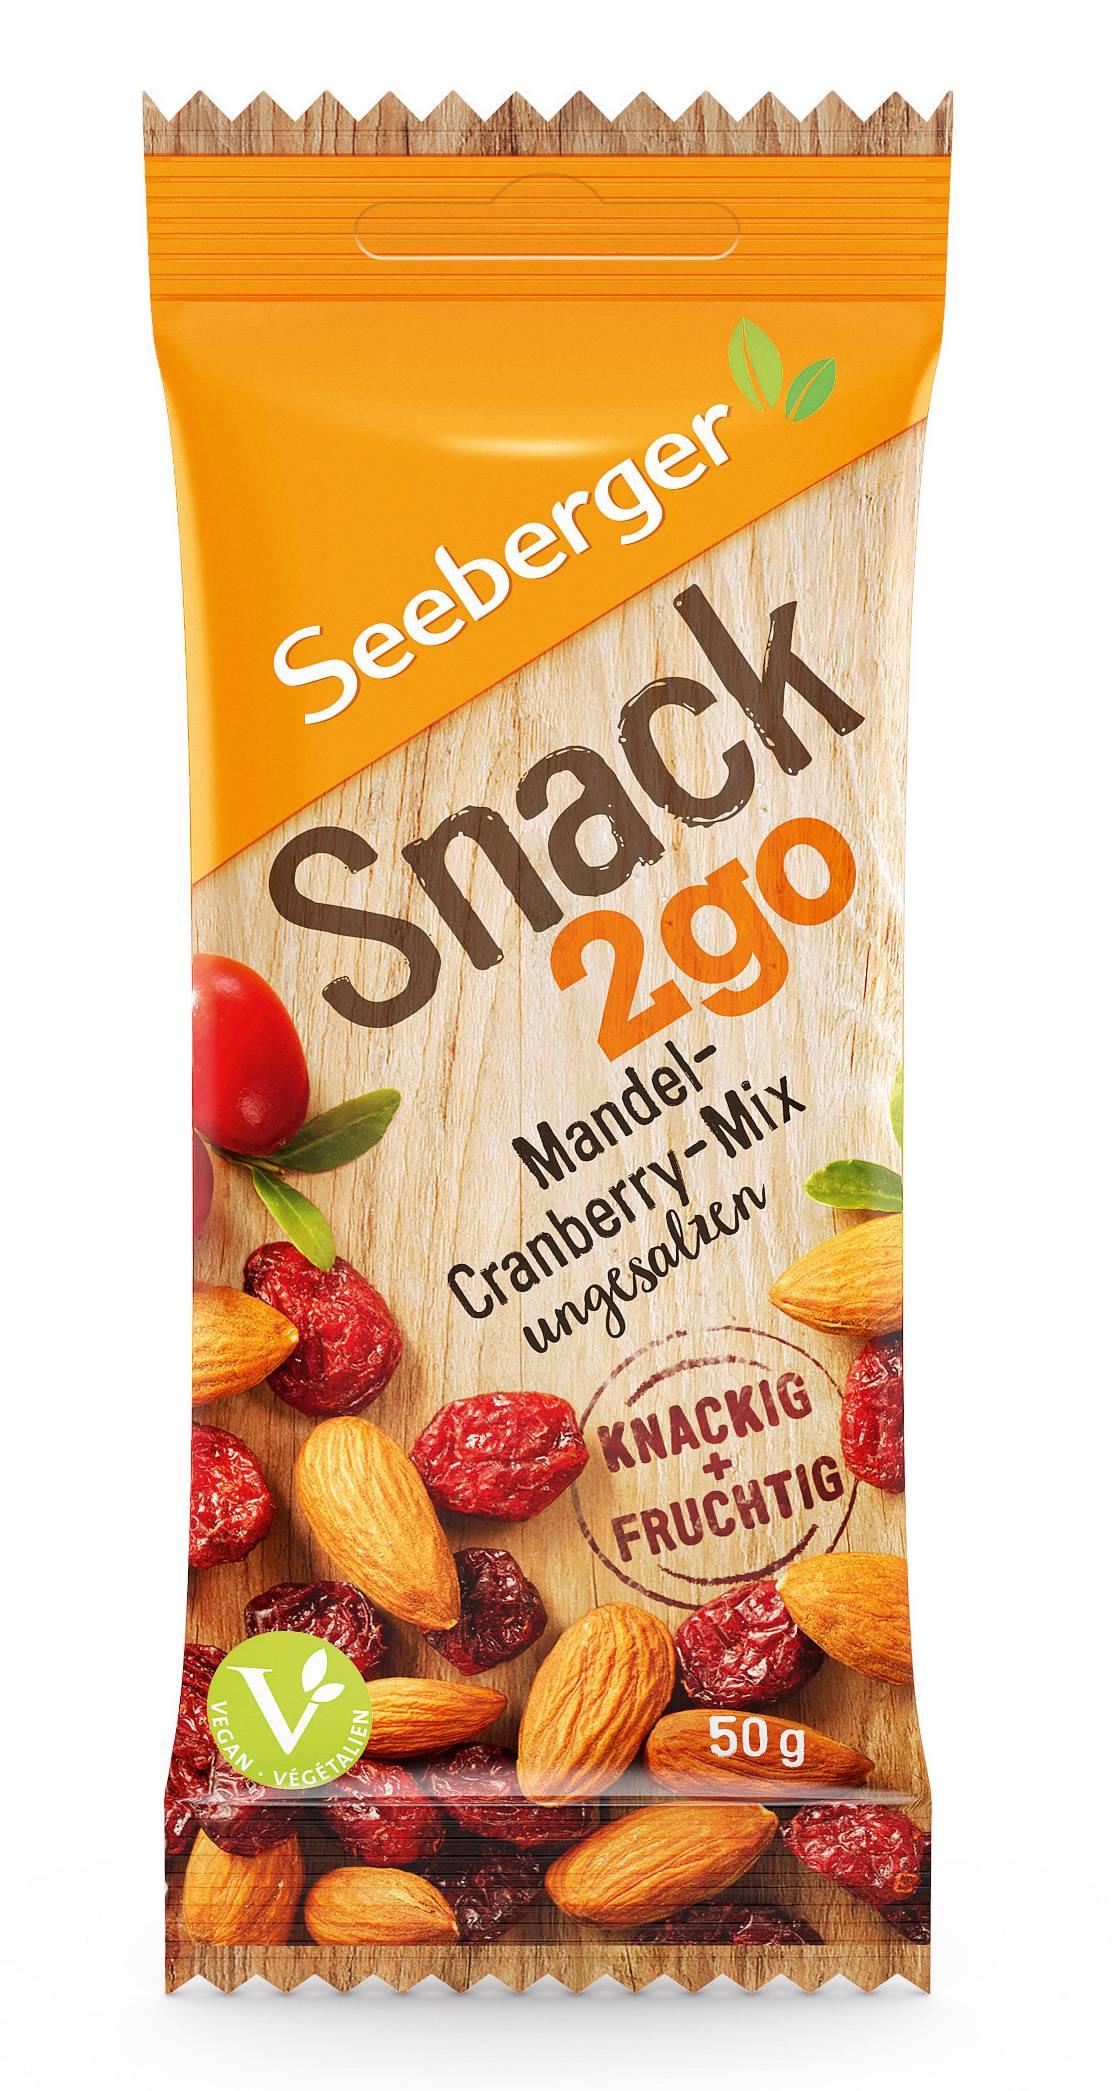 Seeberger: Snack2go / Mandel-Cranberry-Mix